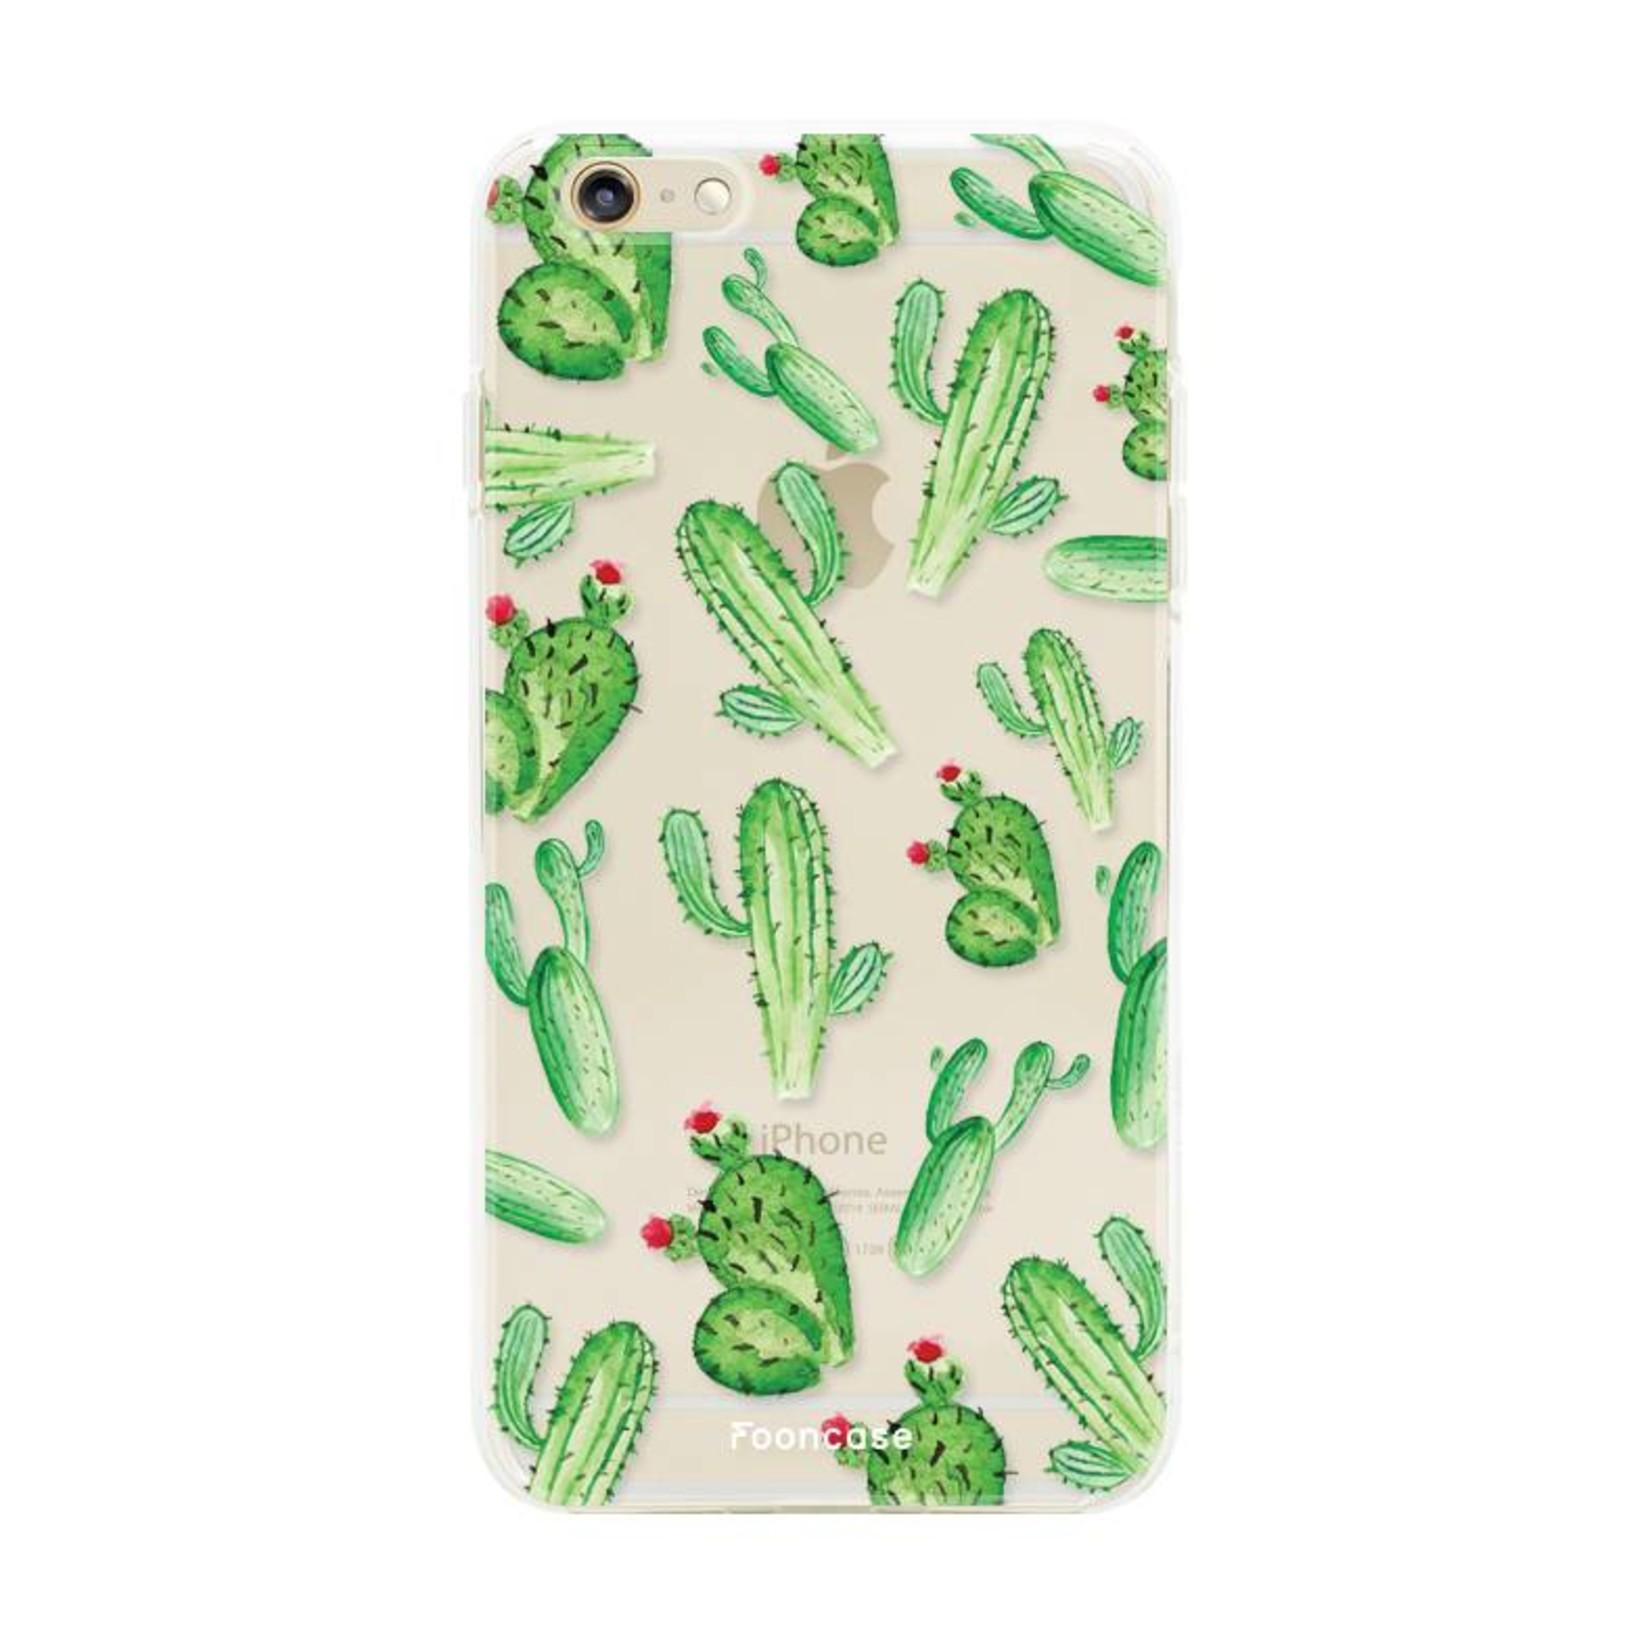 FOONCASE iPhone 6 / 6S hoesje TPU Soft Case - Back Cover - Cactus